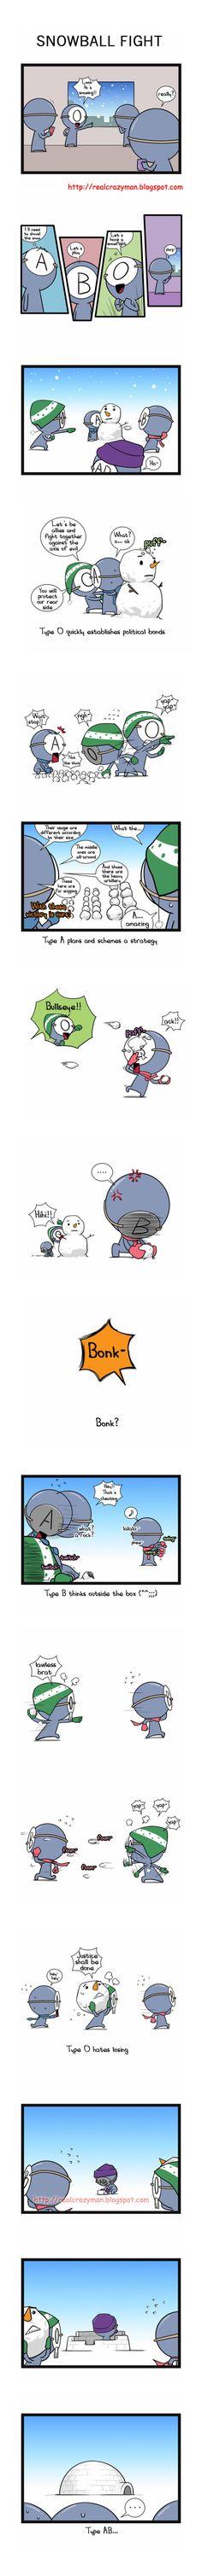 Blood Types Comic: Snowball Fight